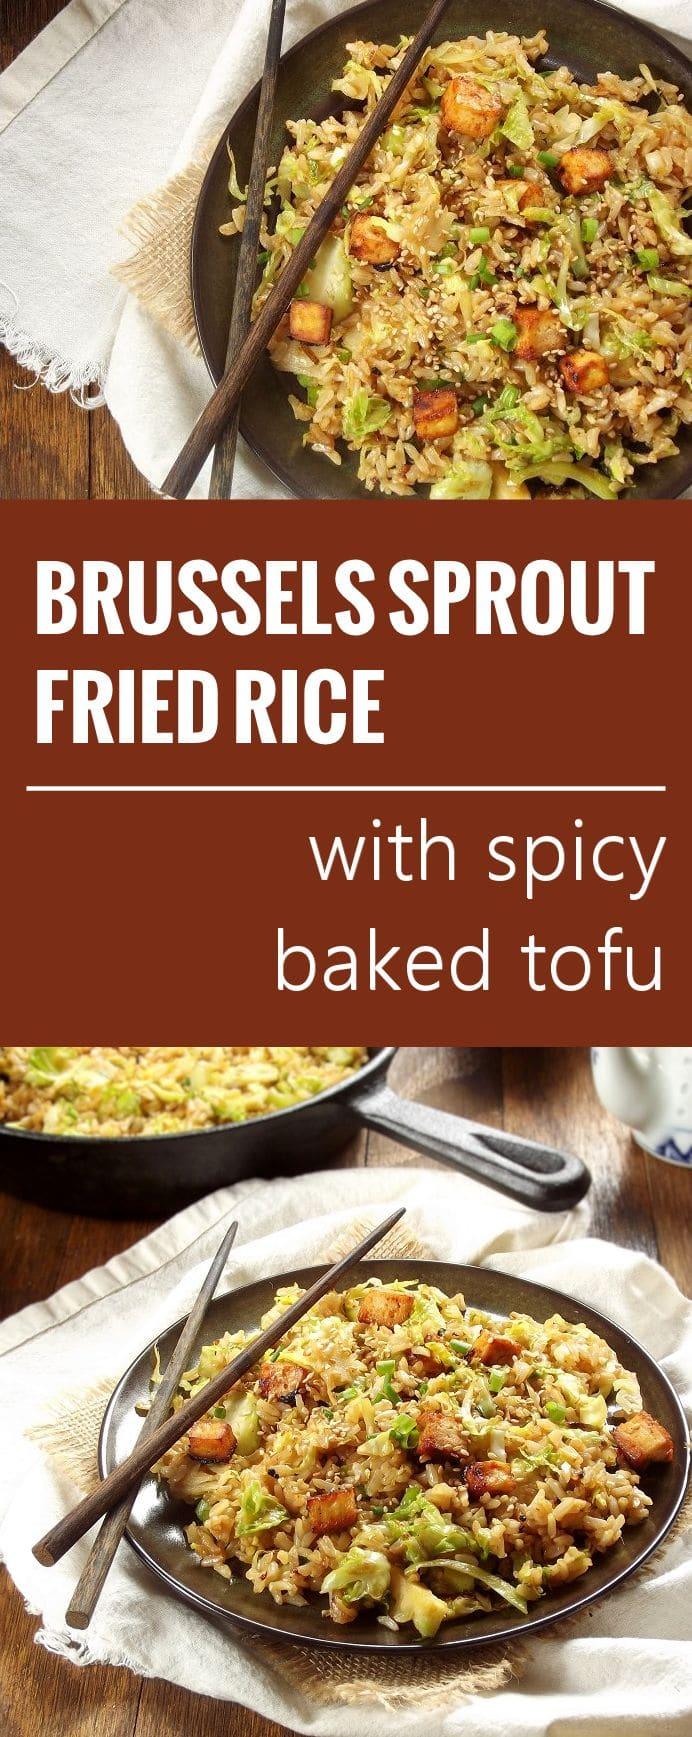 Crispy Baked Tofu Fries With Sriracha Ketchup Recipe ...